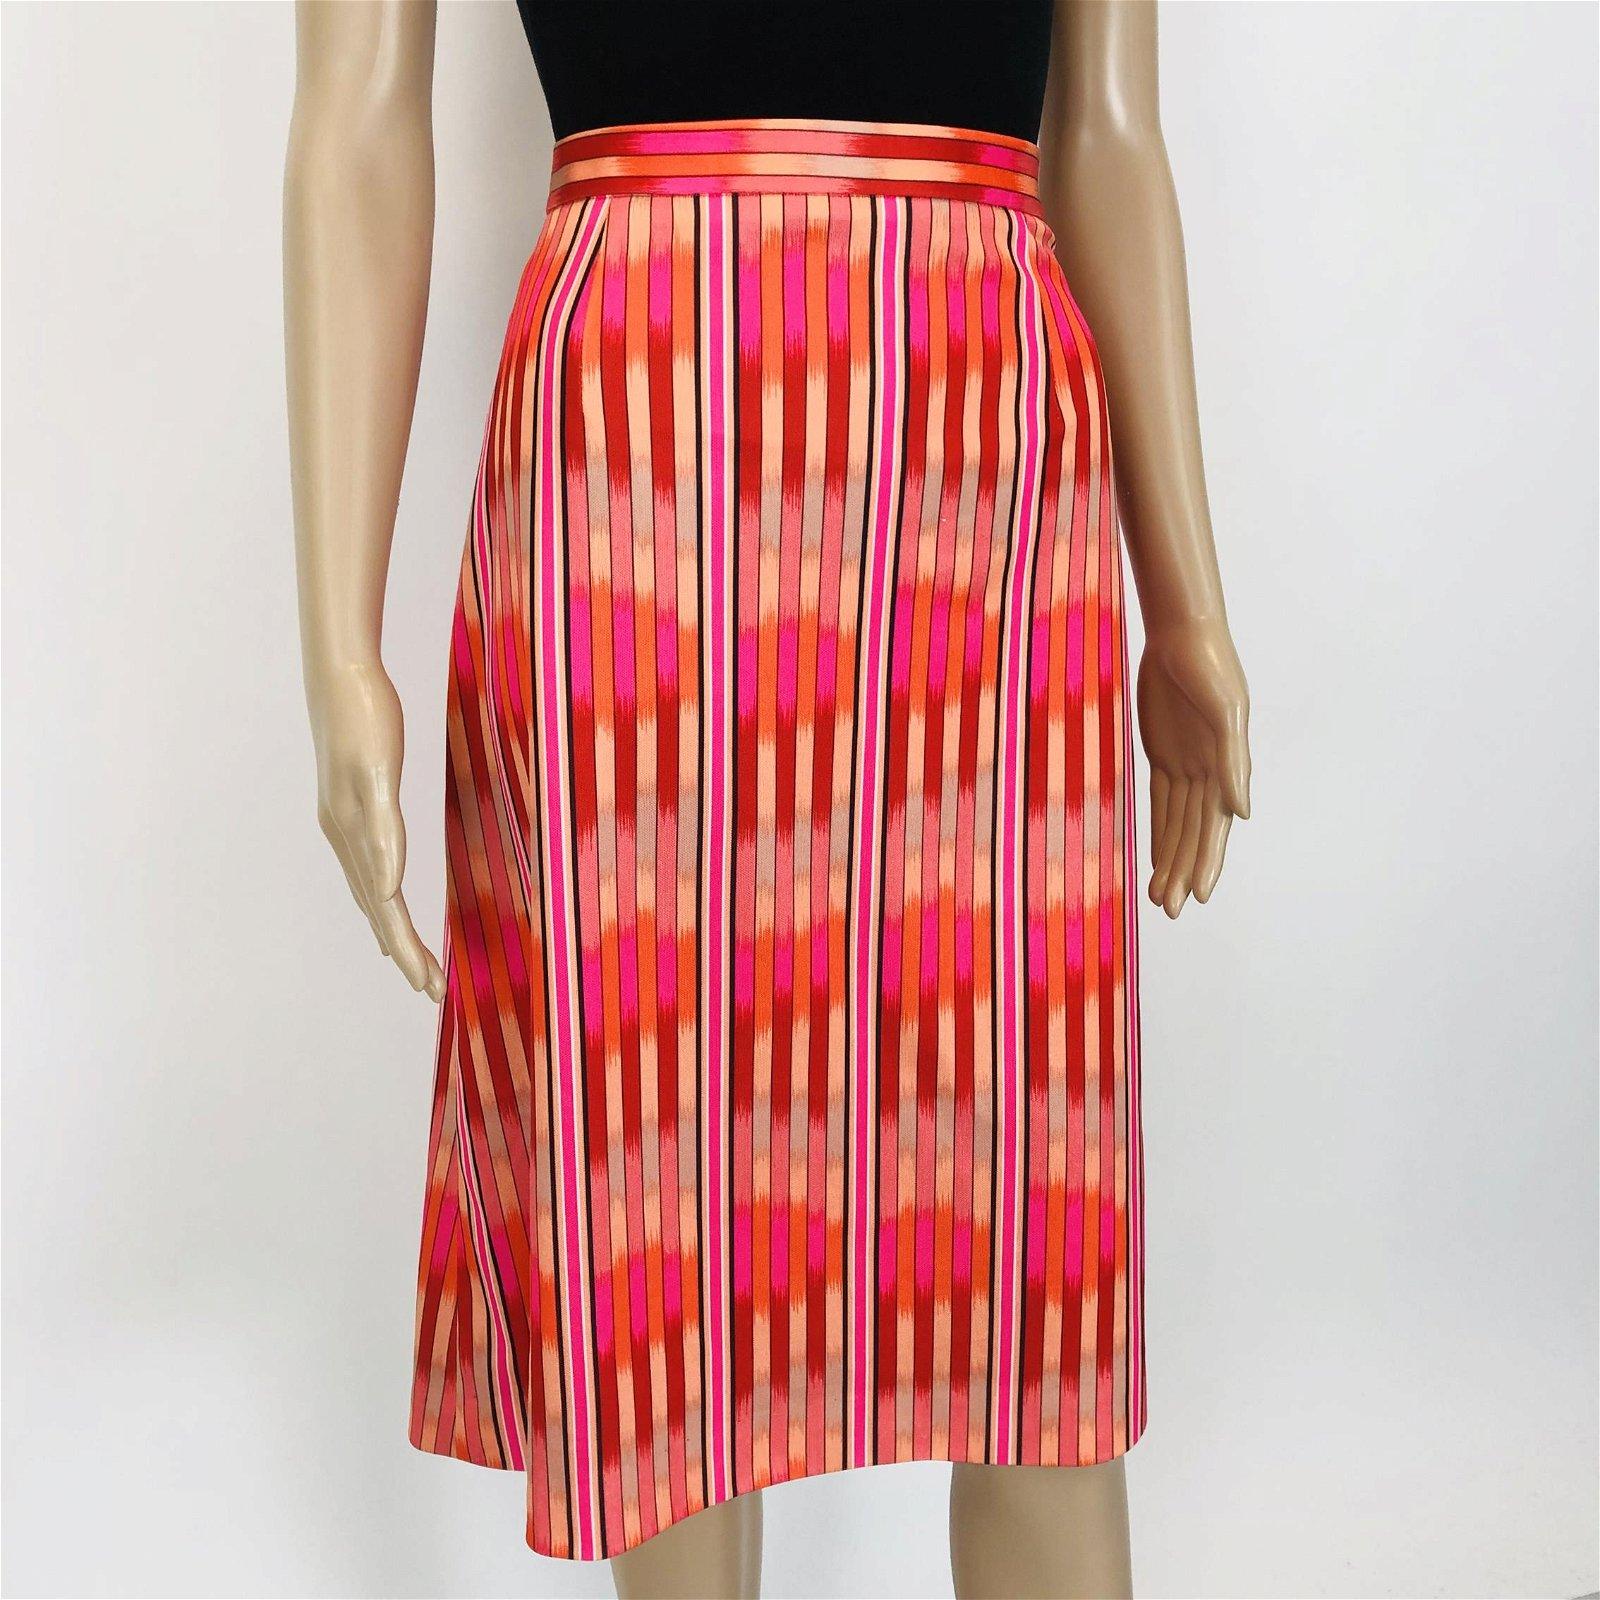 Vintage Women's Colorful Knee Length Skirt EUR 42 US 12